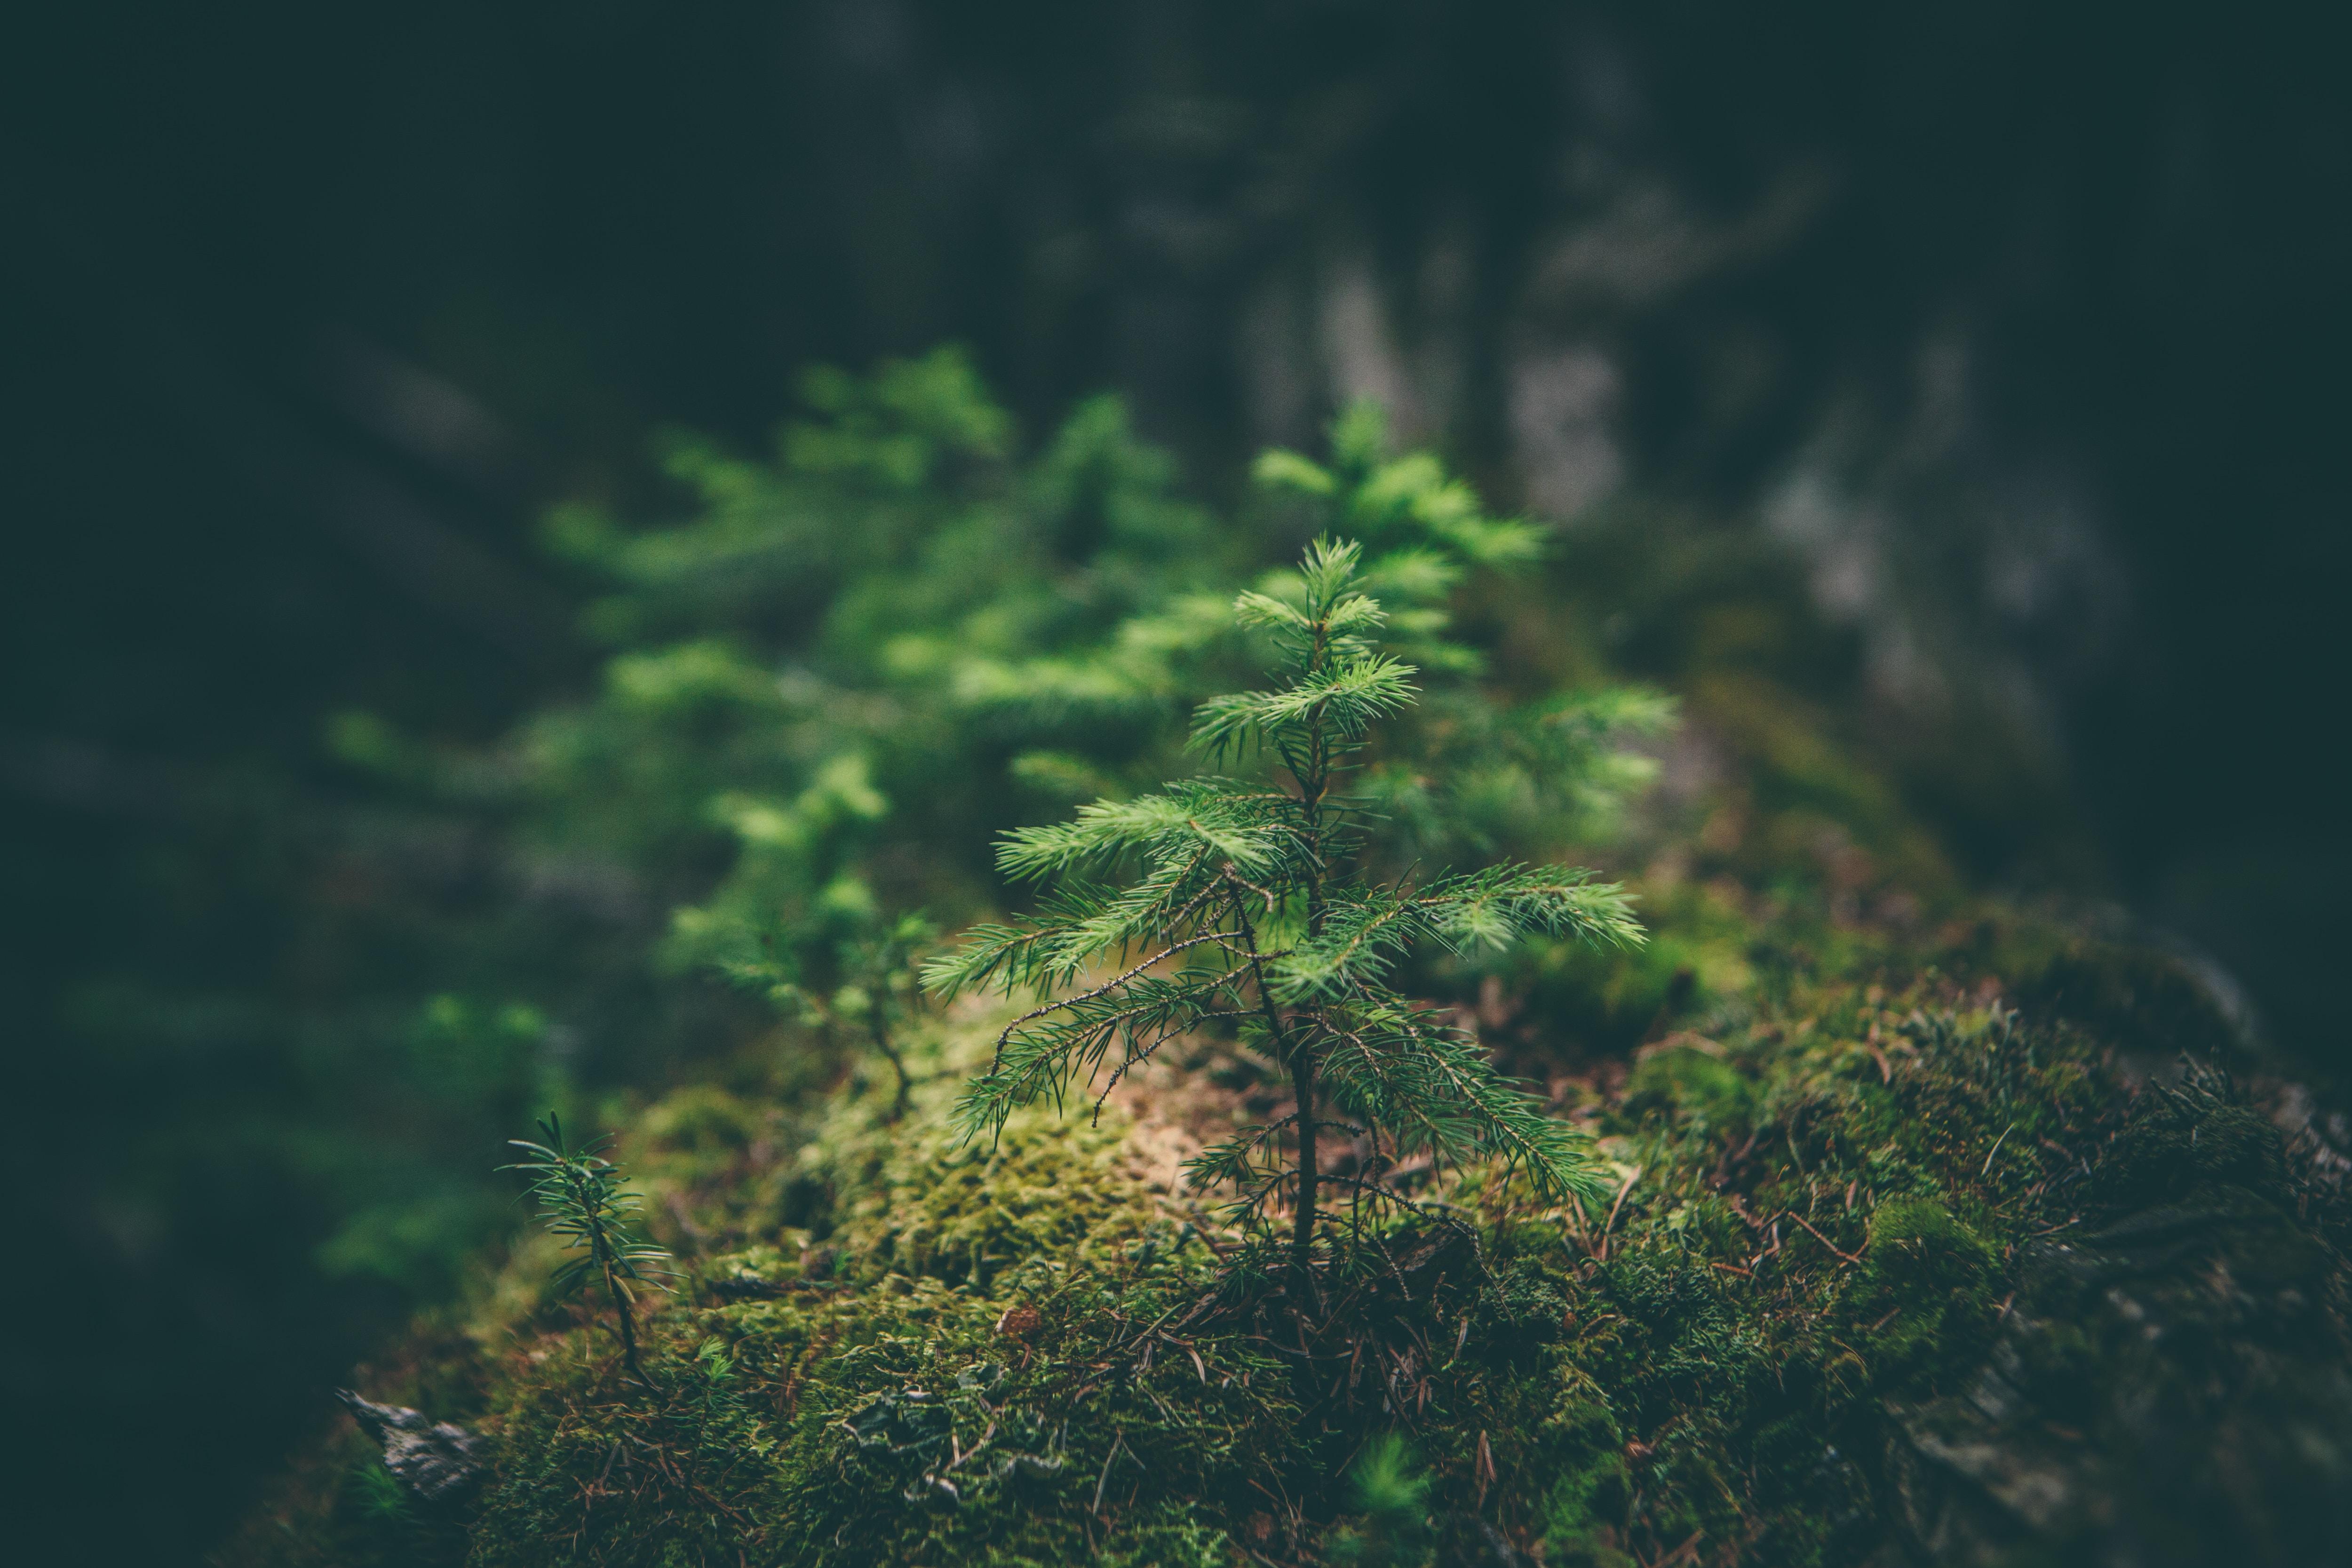 Serenity poetry stories